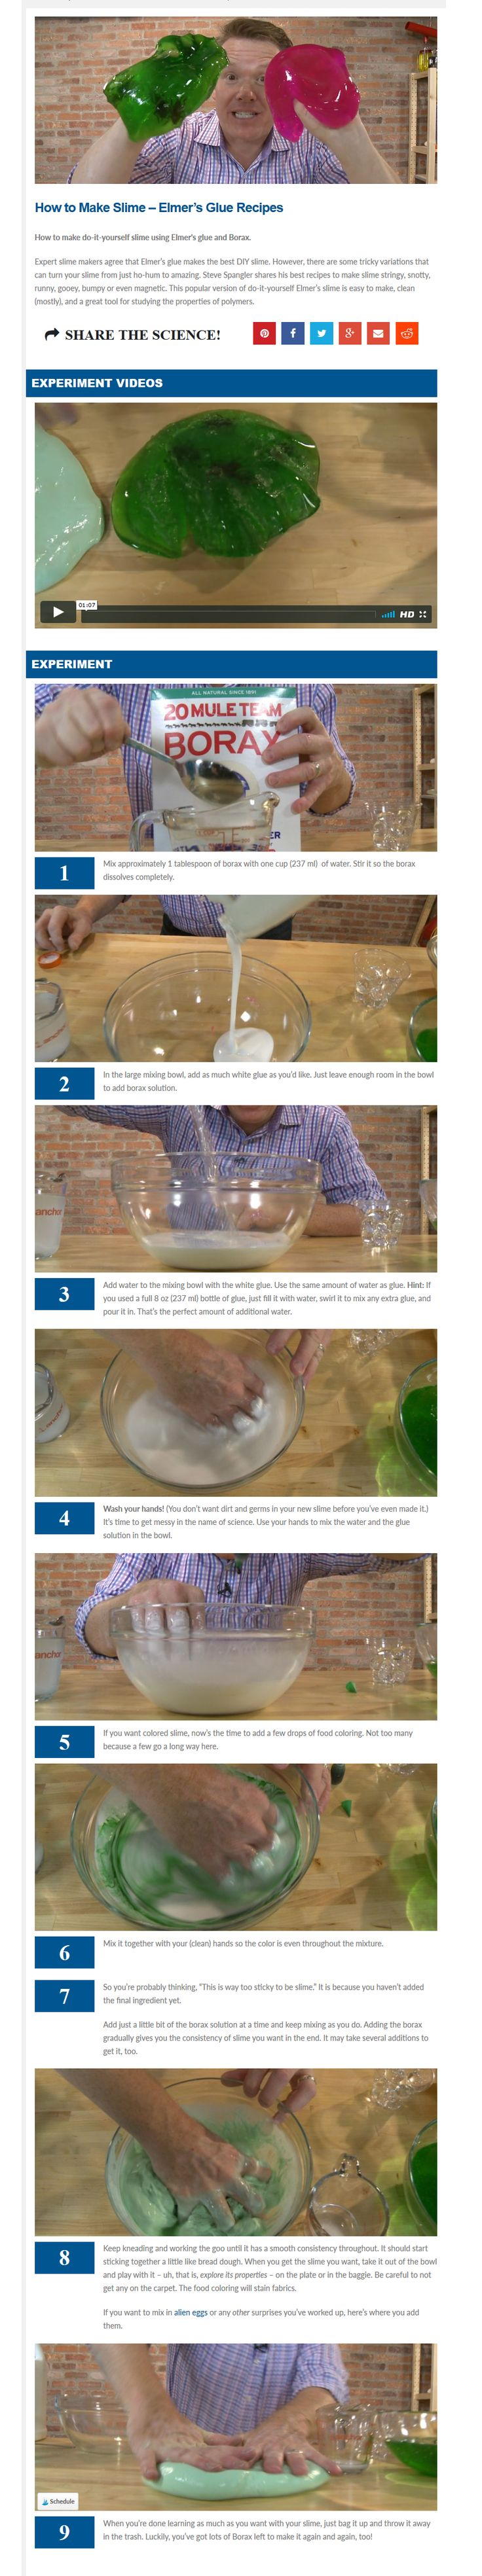 How To Make Doityourself Slime Using Elmer's Glue And Borax Expert